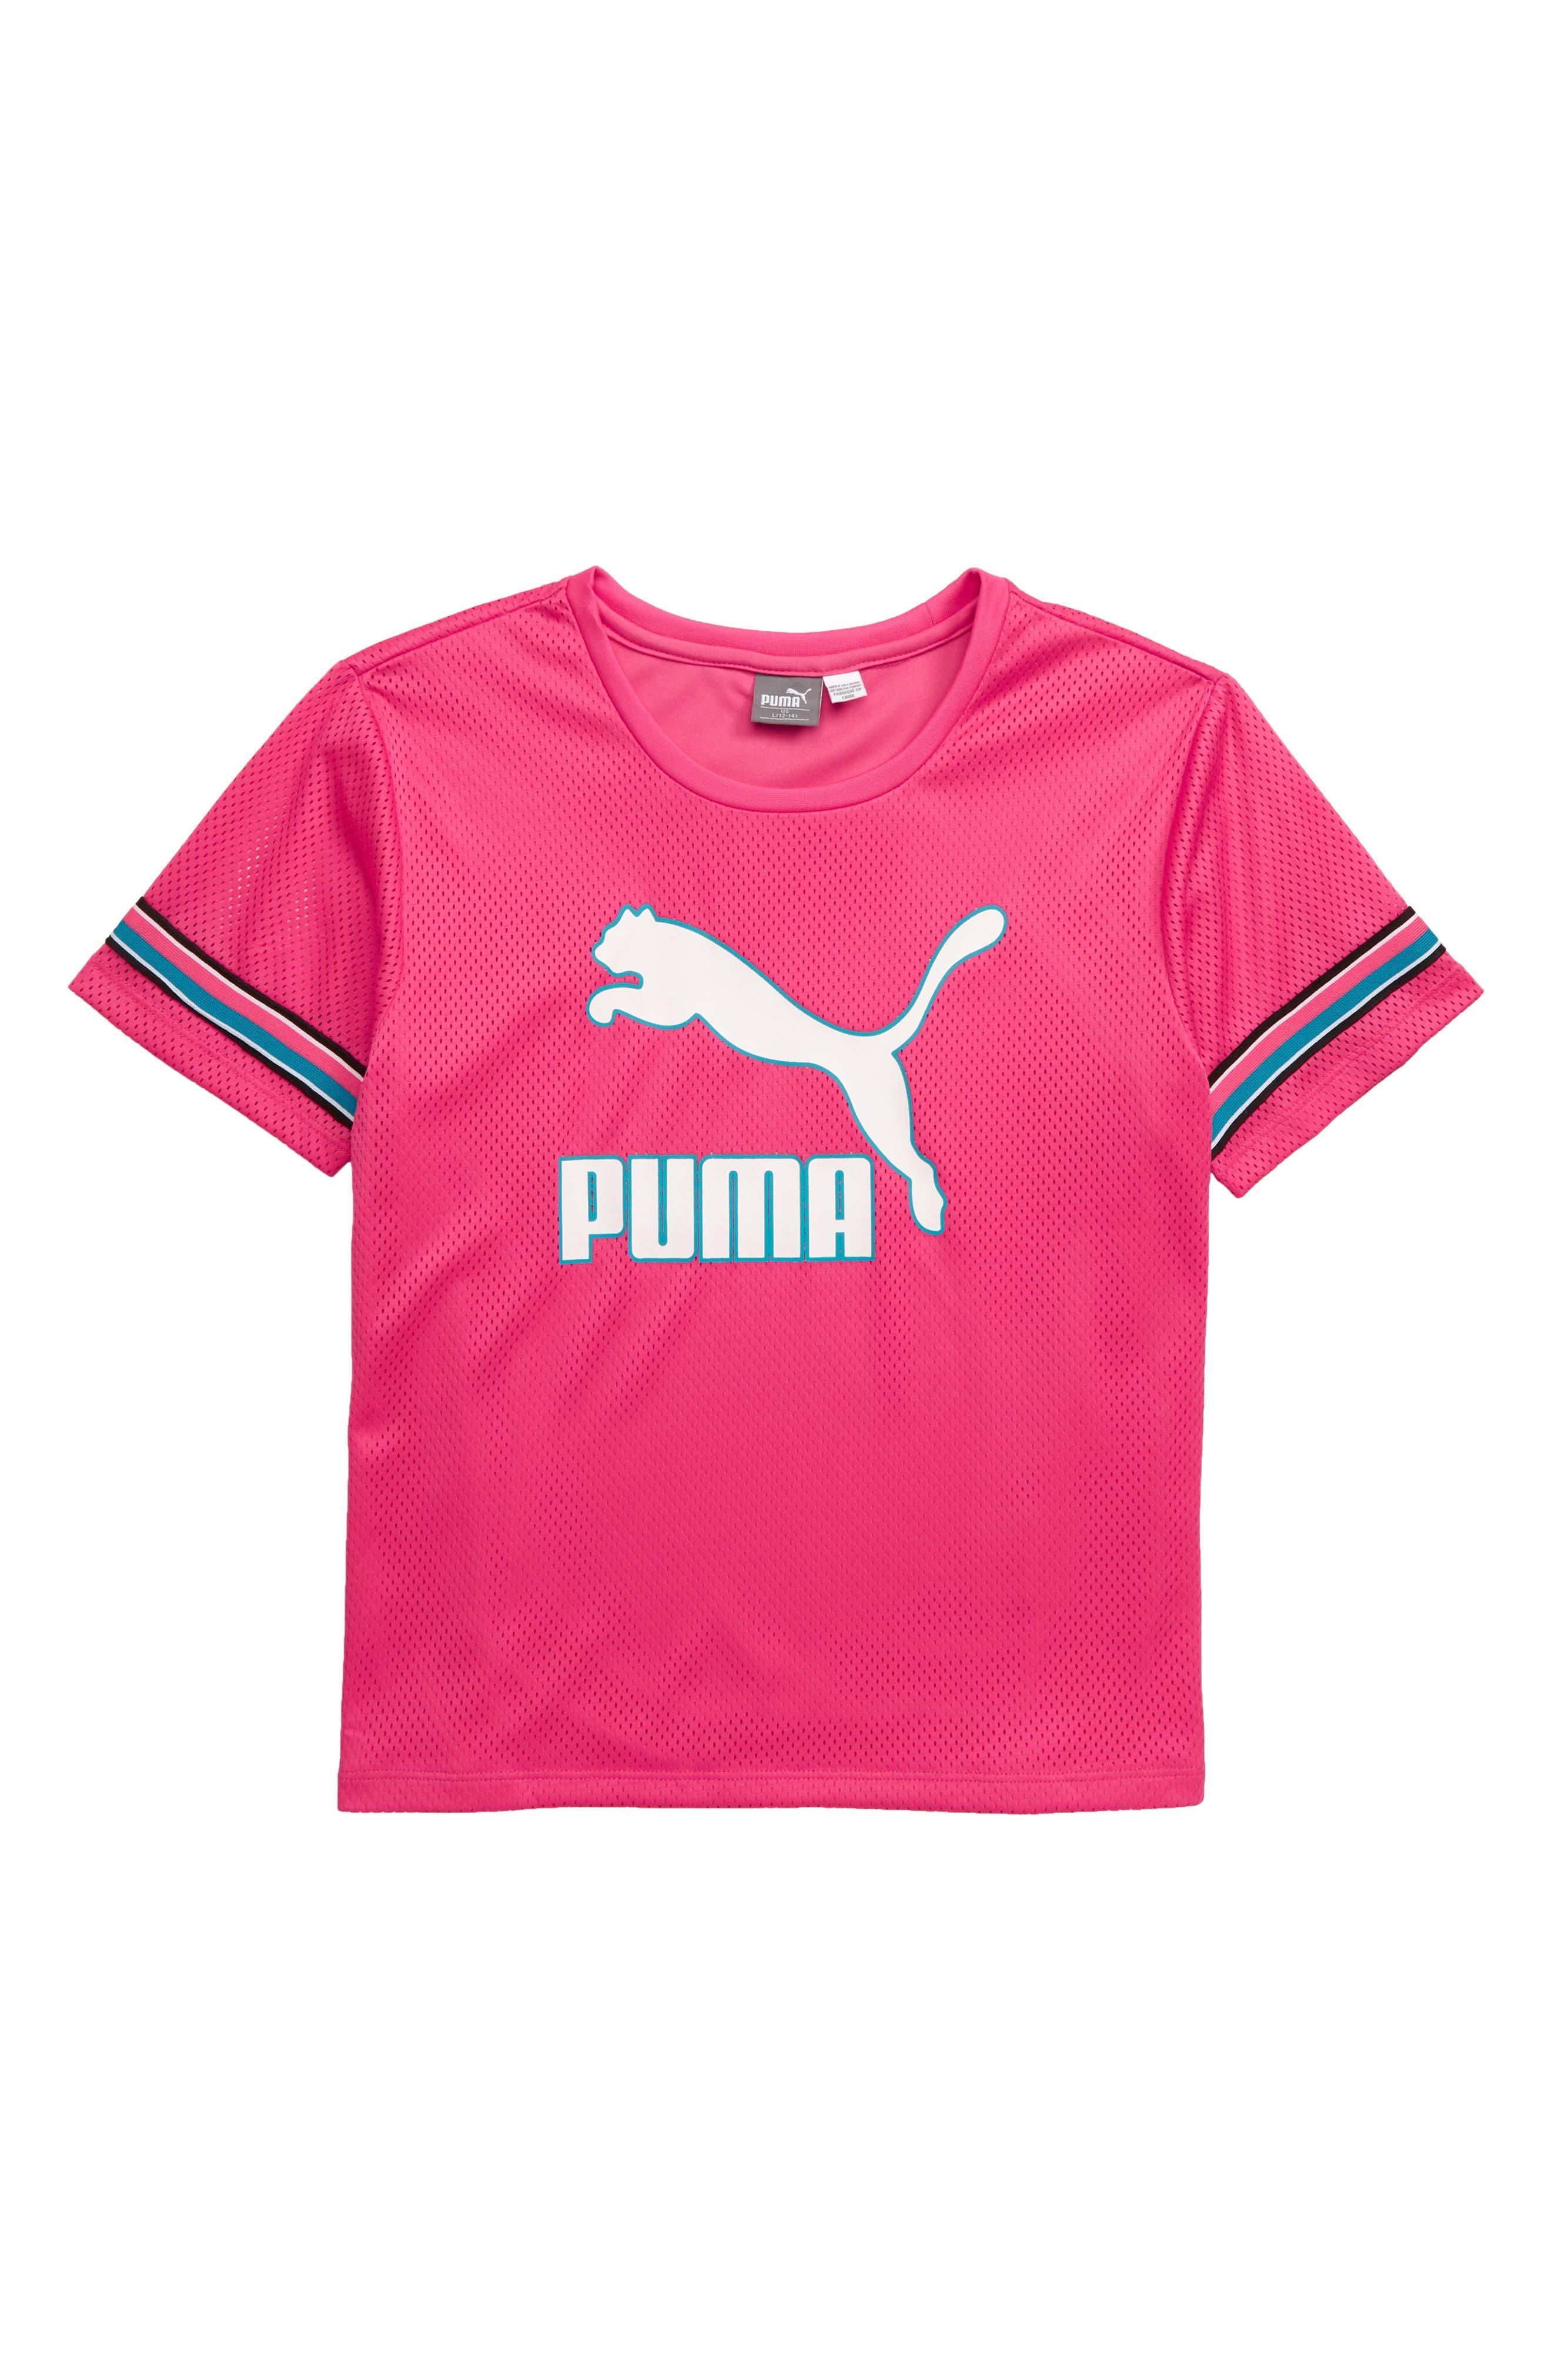 Girls Puma Logo Mesh Shirt